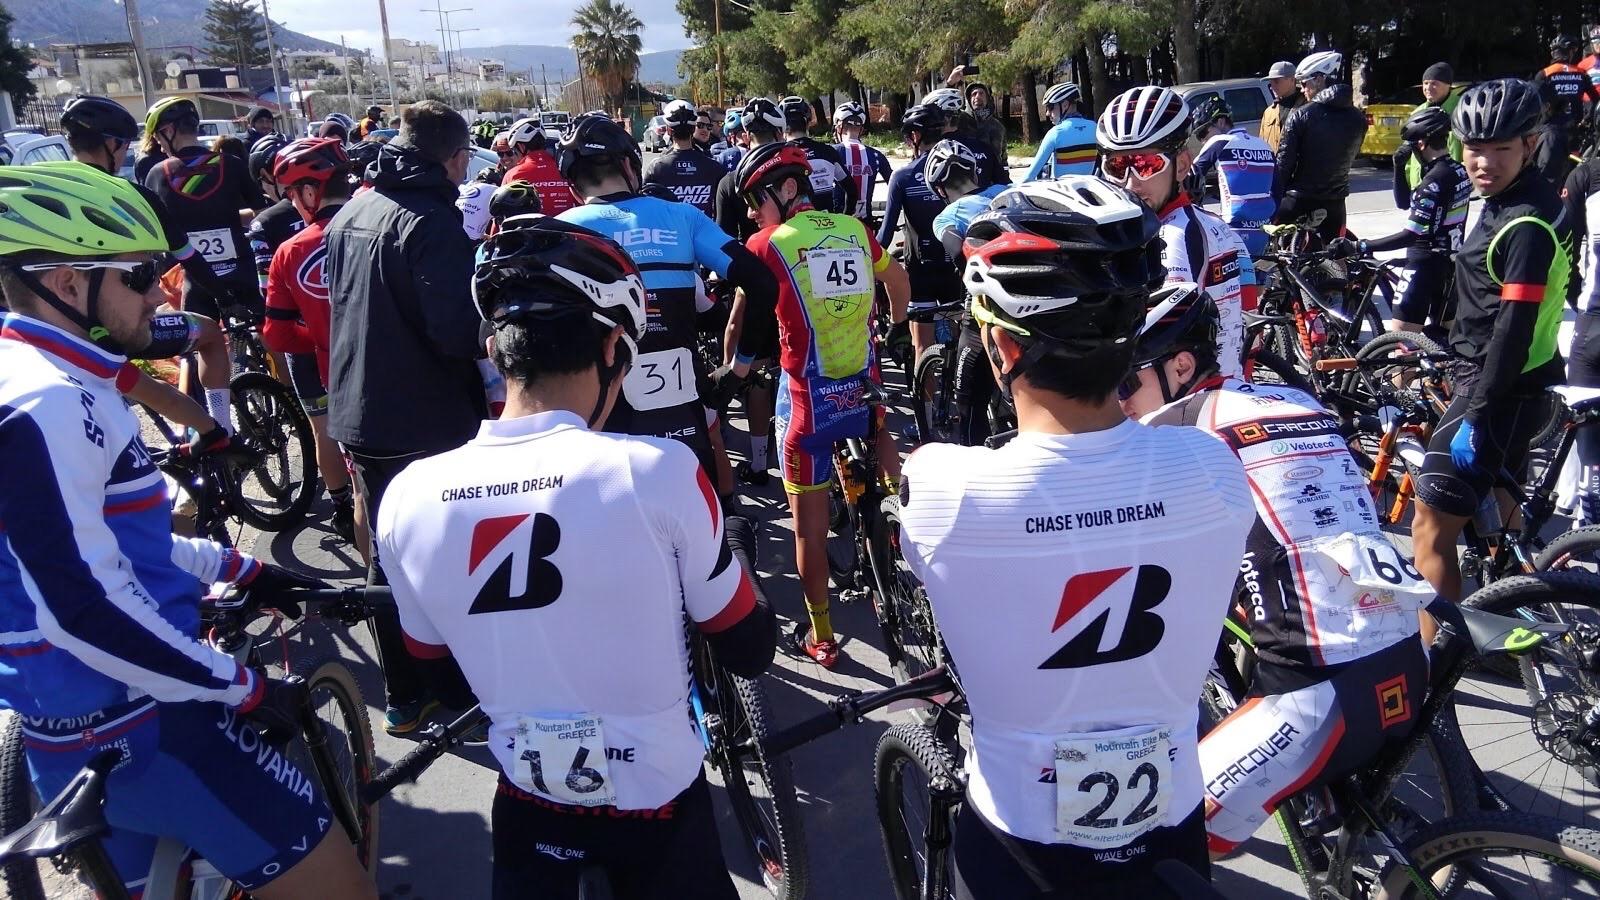 【MTB ギリシャS1】Salamina EPIC#2 4日間ステージレース第2弾、平野38位、沢田39位